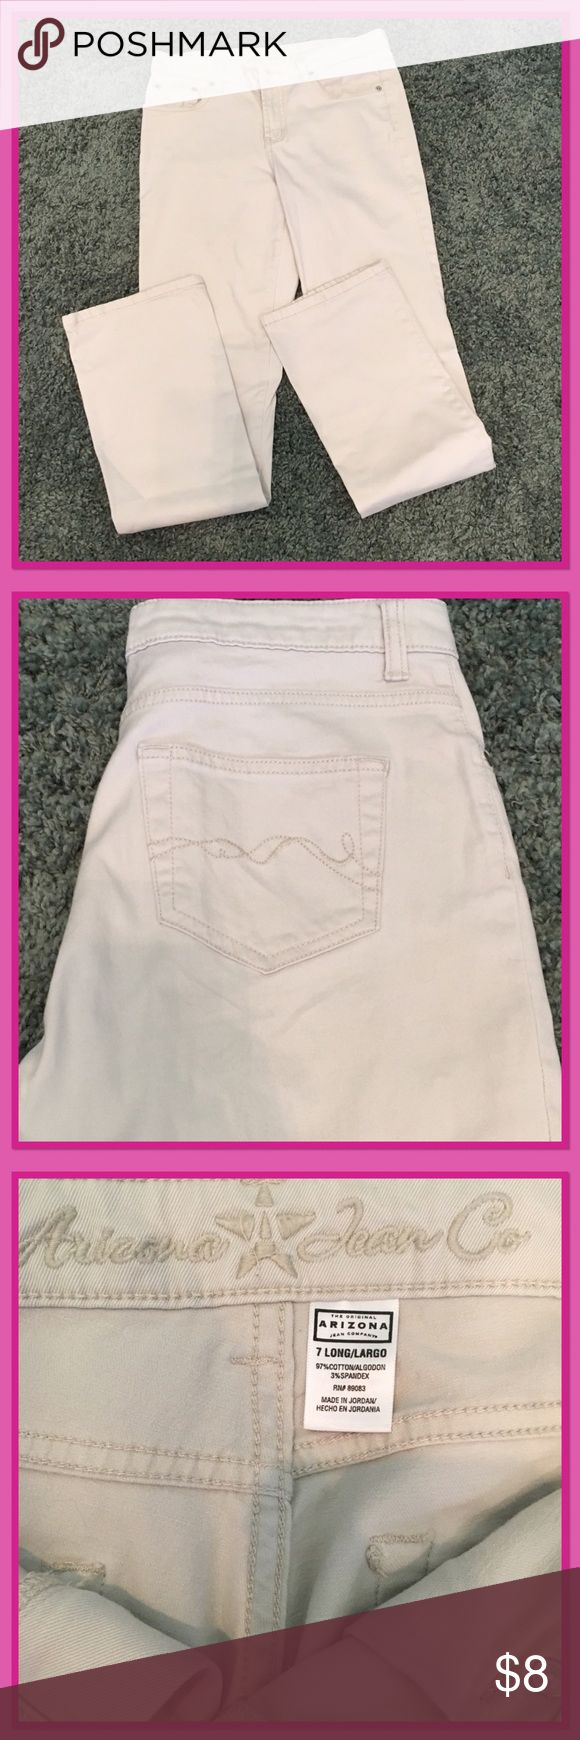 Women's cream jeans Great shape! Size long that is true to size. Arizona Jean Company Pants